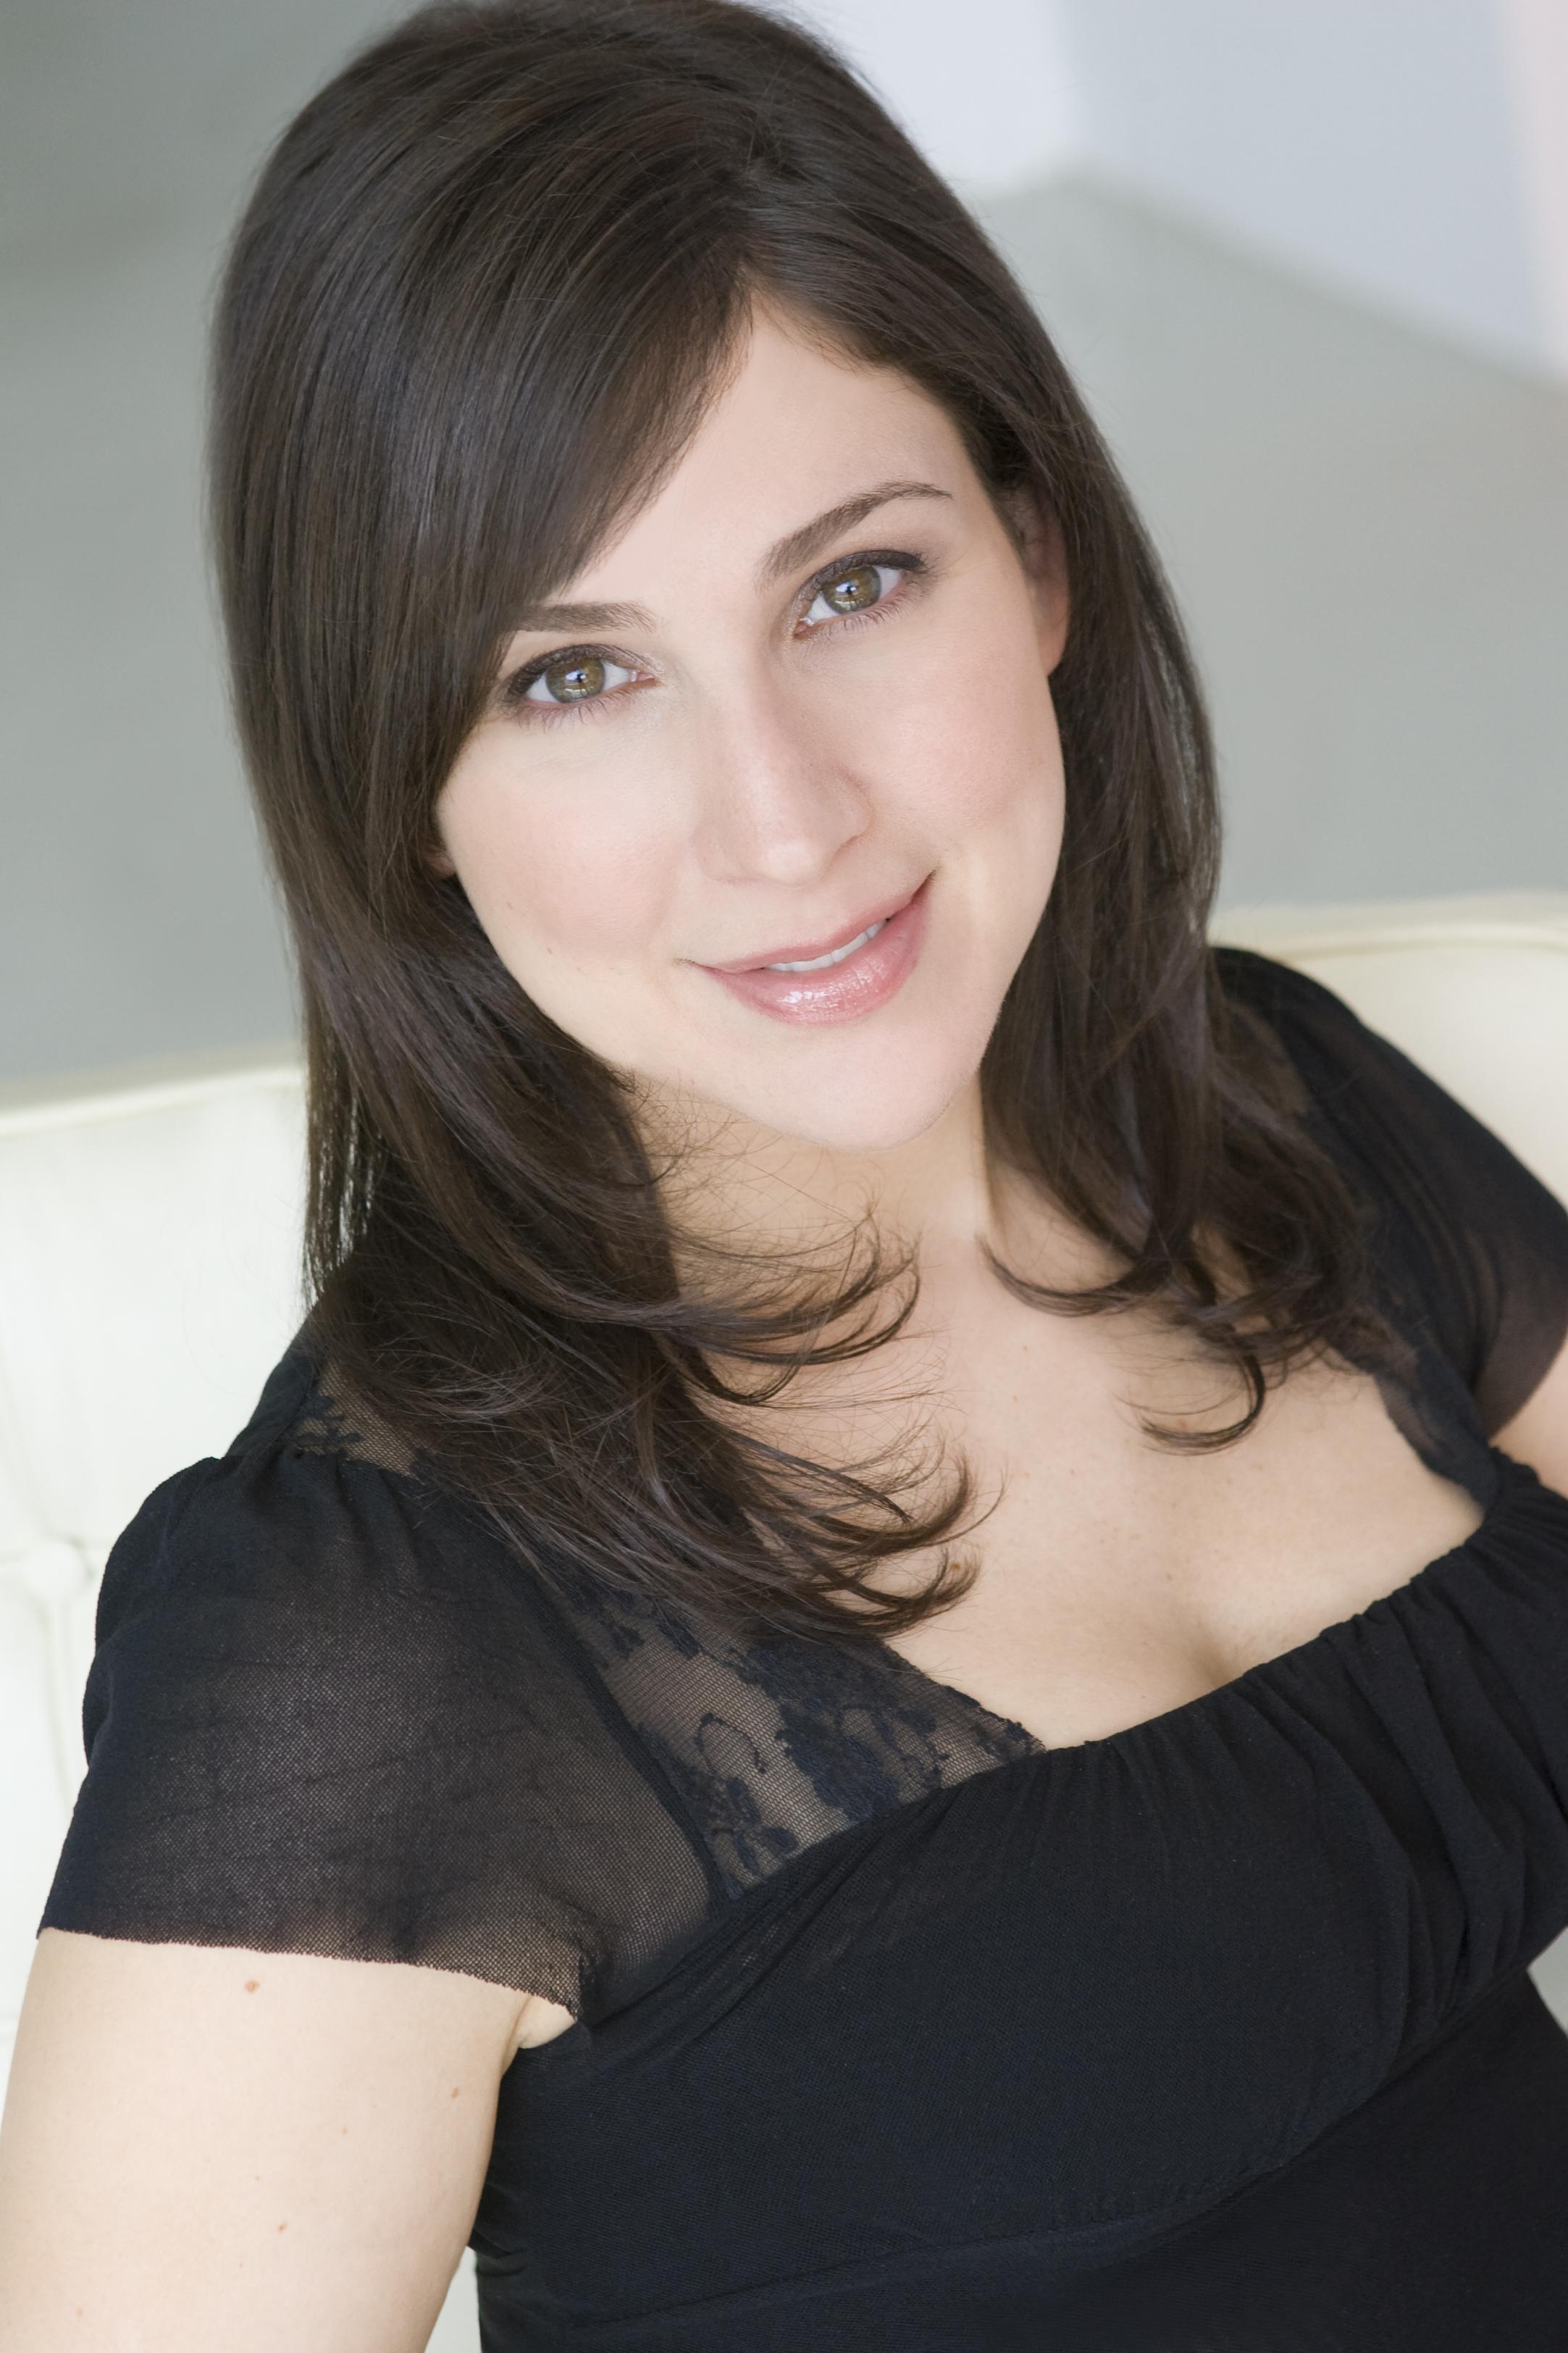 Brenda Janowitz Official Headshot